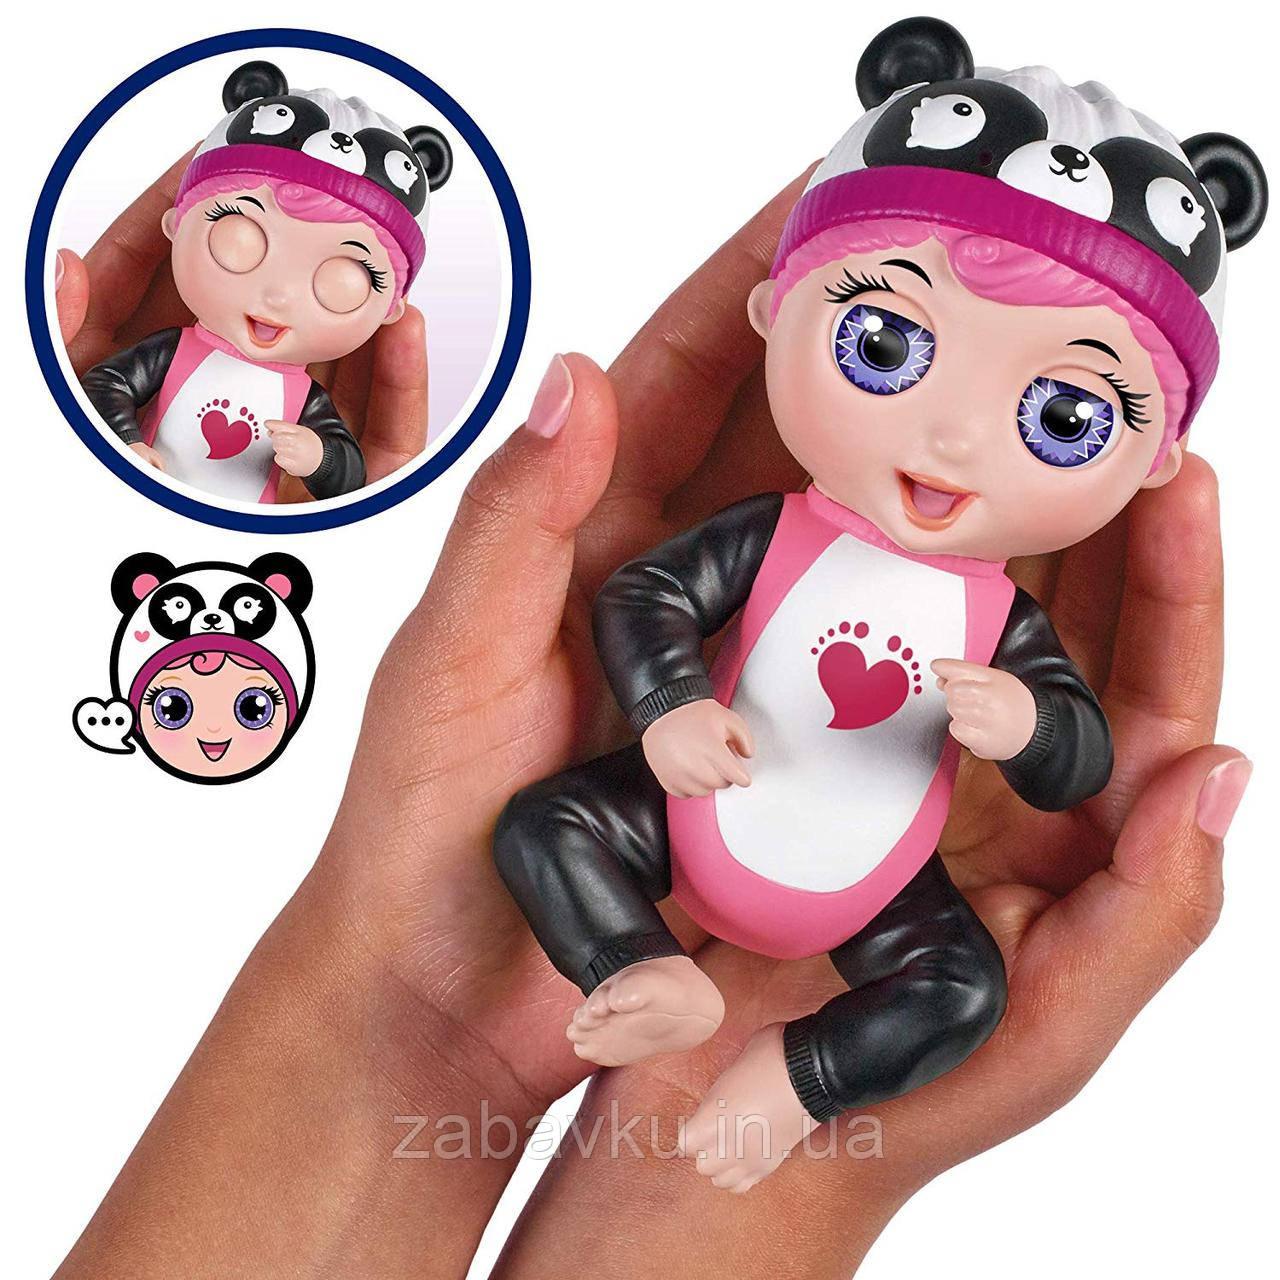 Інтерактивна лялька панда Гебі Tiny Toes Giggling Gabby Panda Toy оригінал